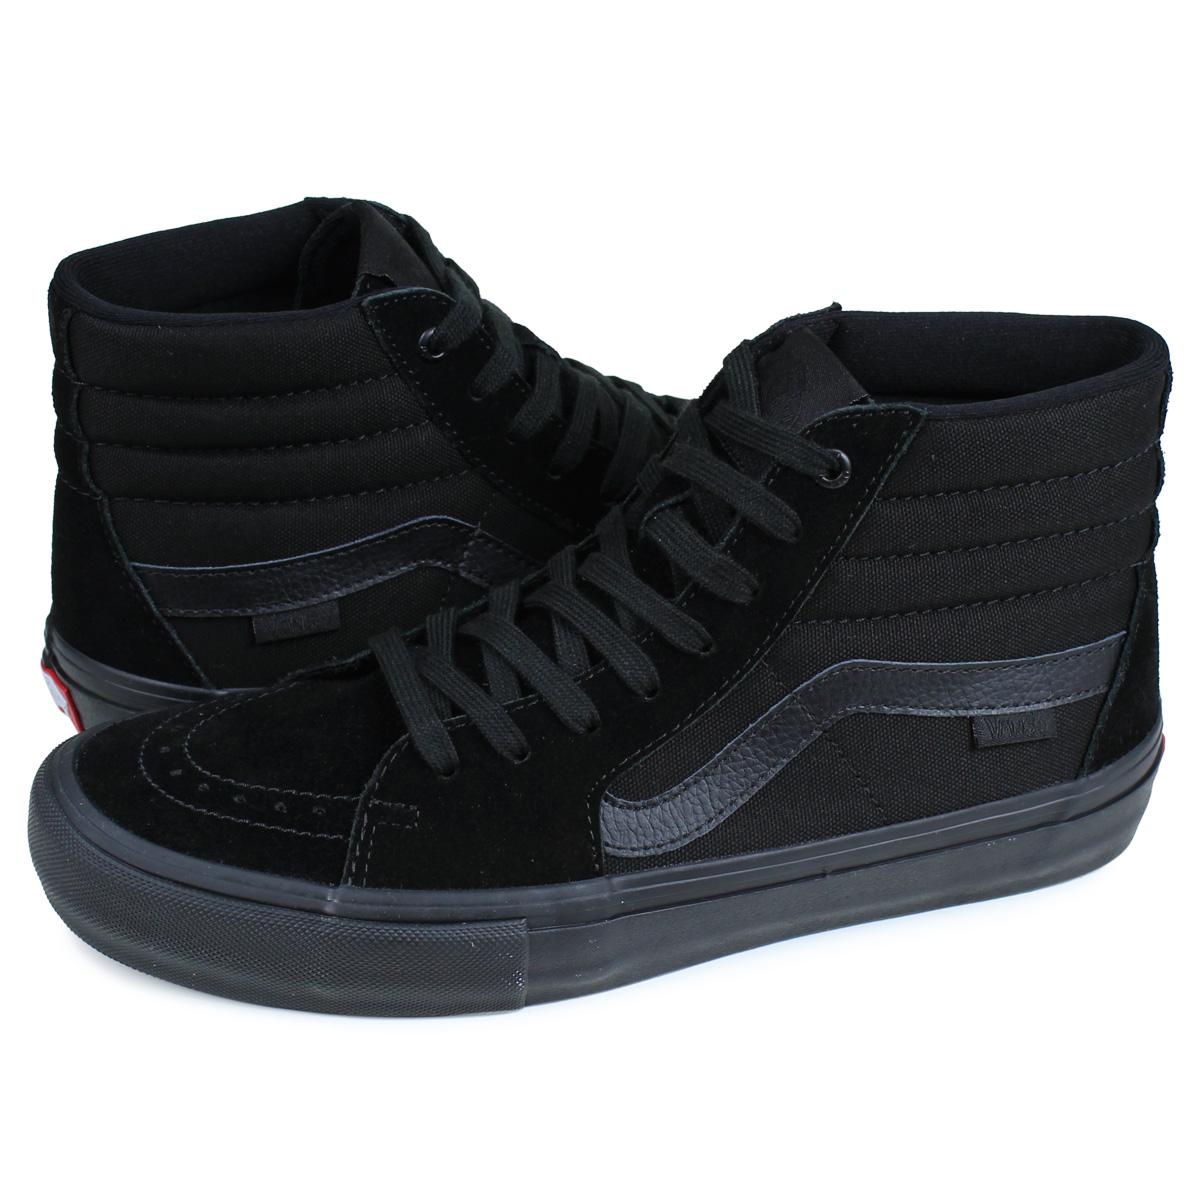 VANS SK8-HI PRO バンズ スニーカー メンズ ヴァンズ スケートハイ ブラック 黒 VN000VHG1OJ [8/27 追加入荷]